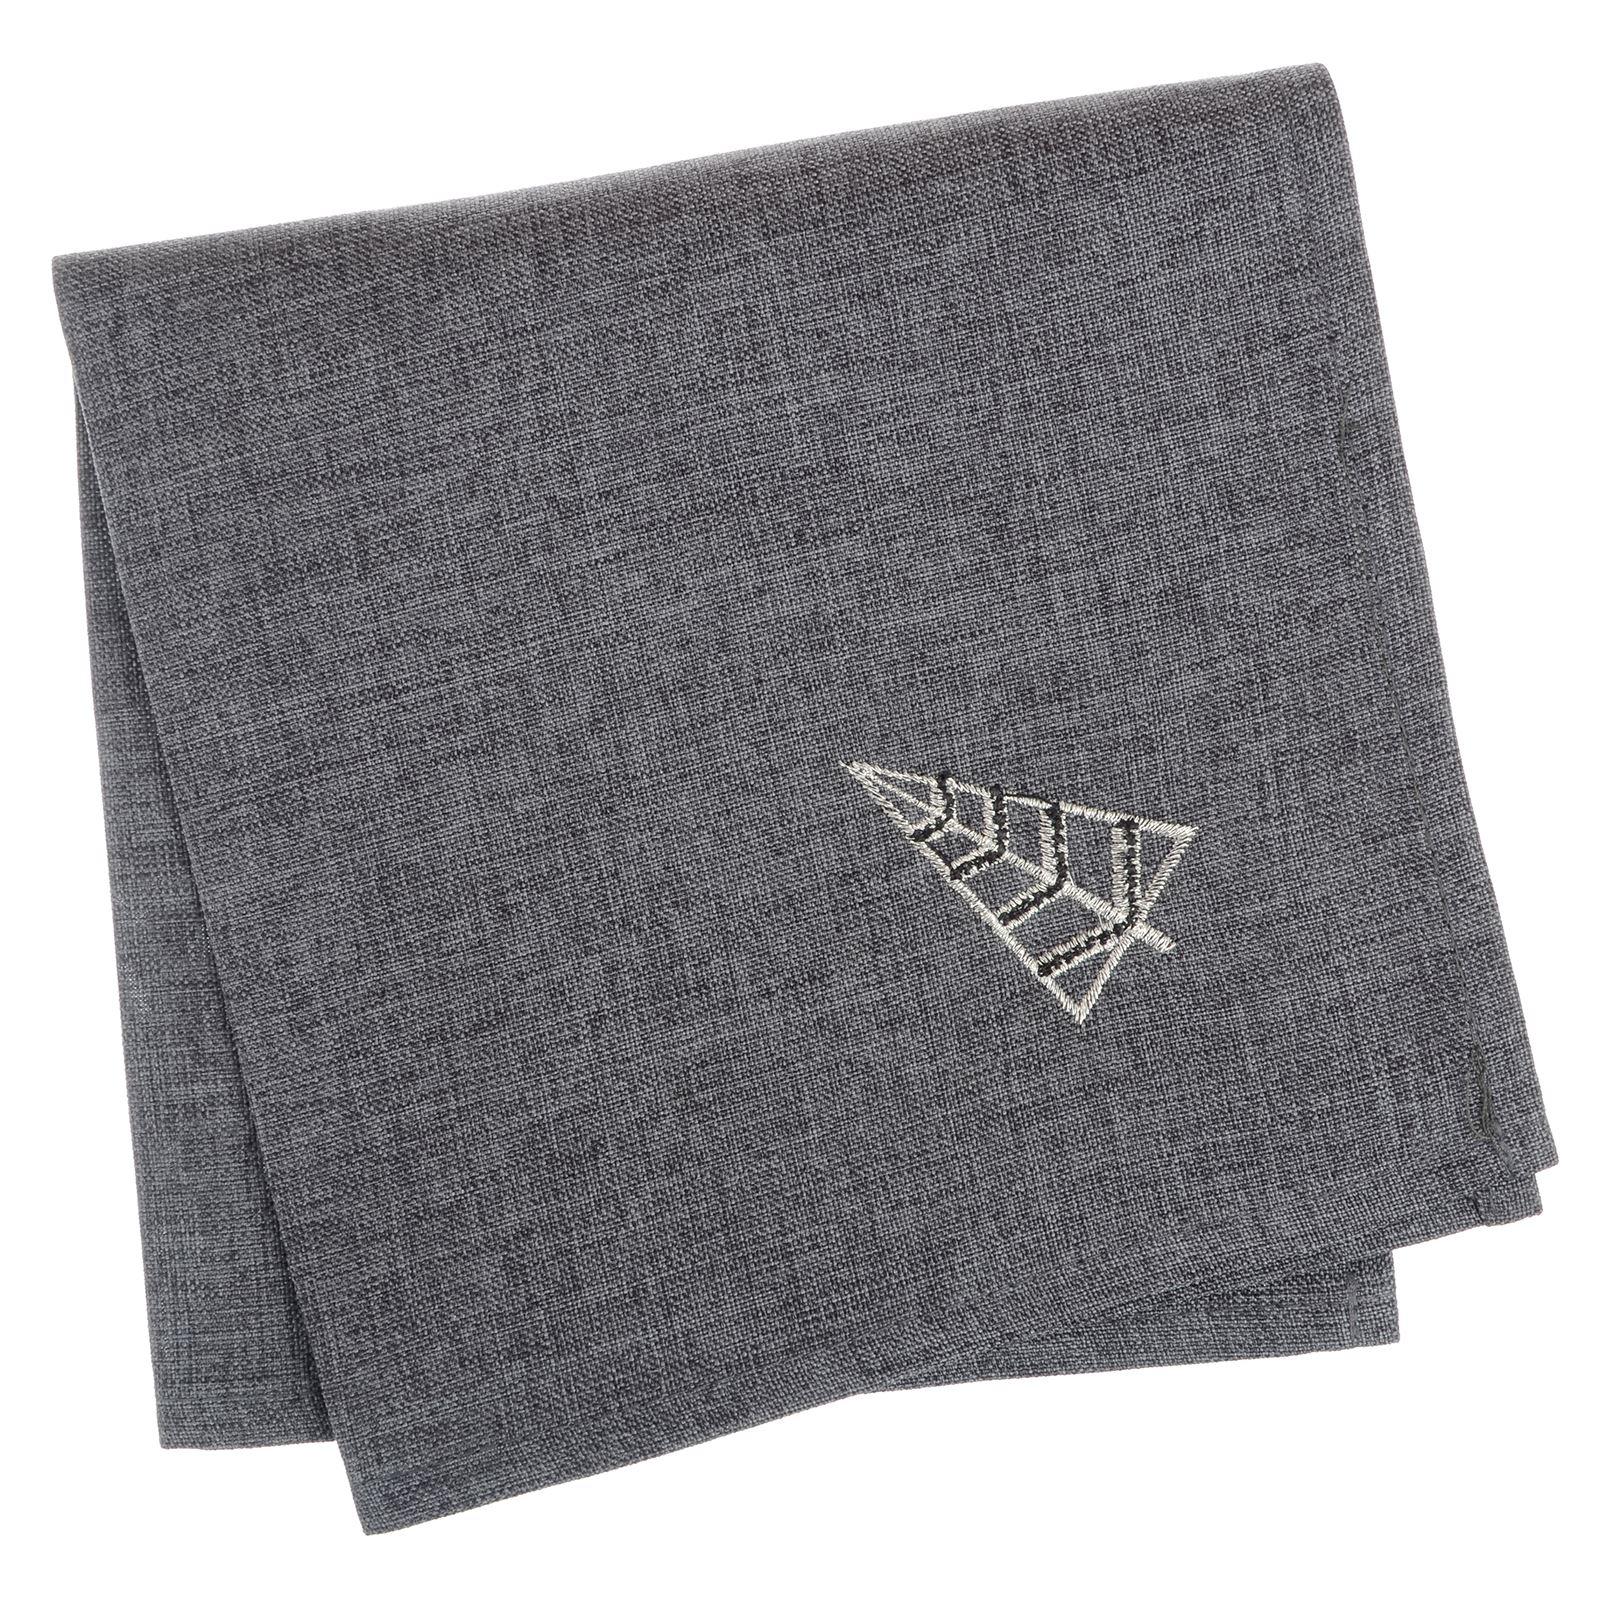 Christmas-Tablecloth-Festive-Pattern-Rectangle-Round-Fabric-Xmas-Room-Decoration Indexbild 21